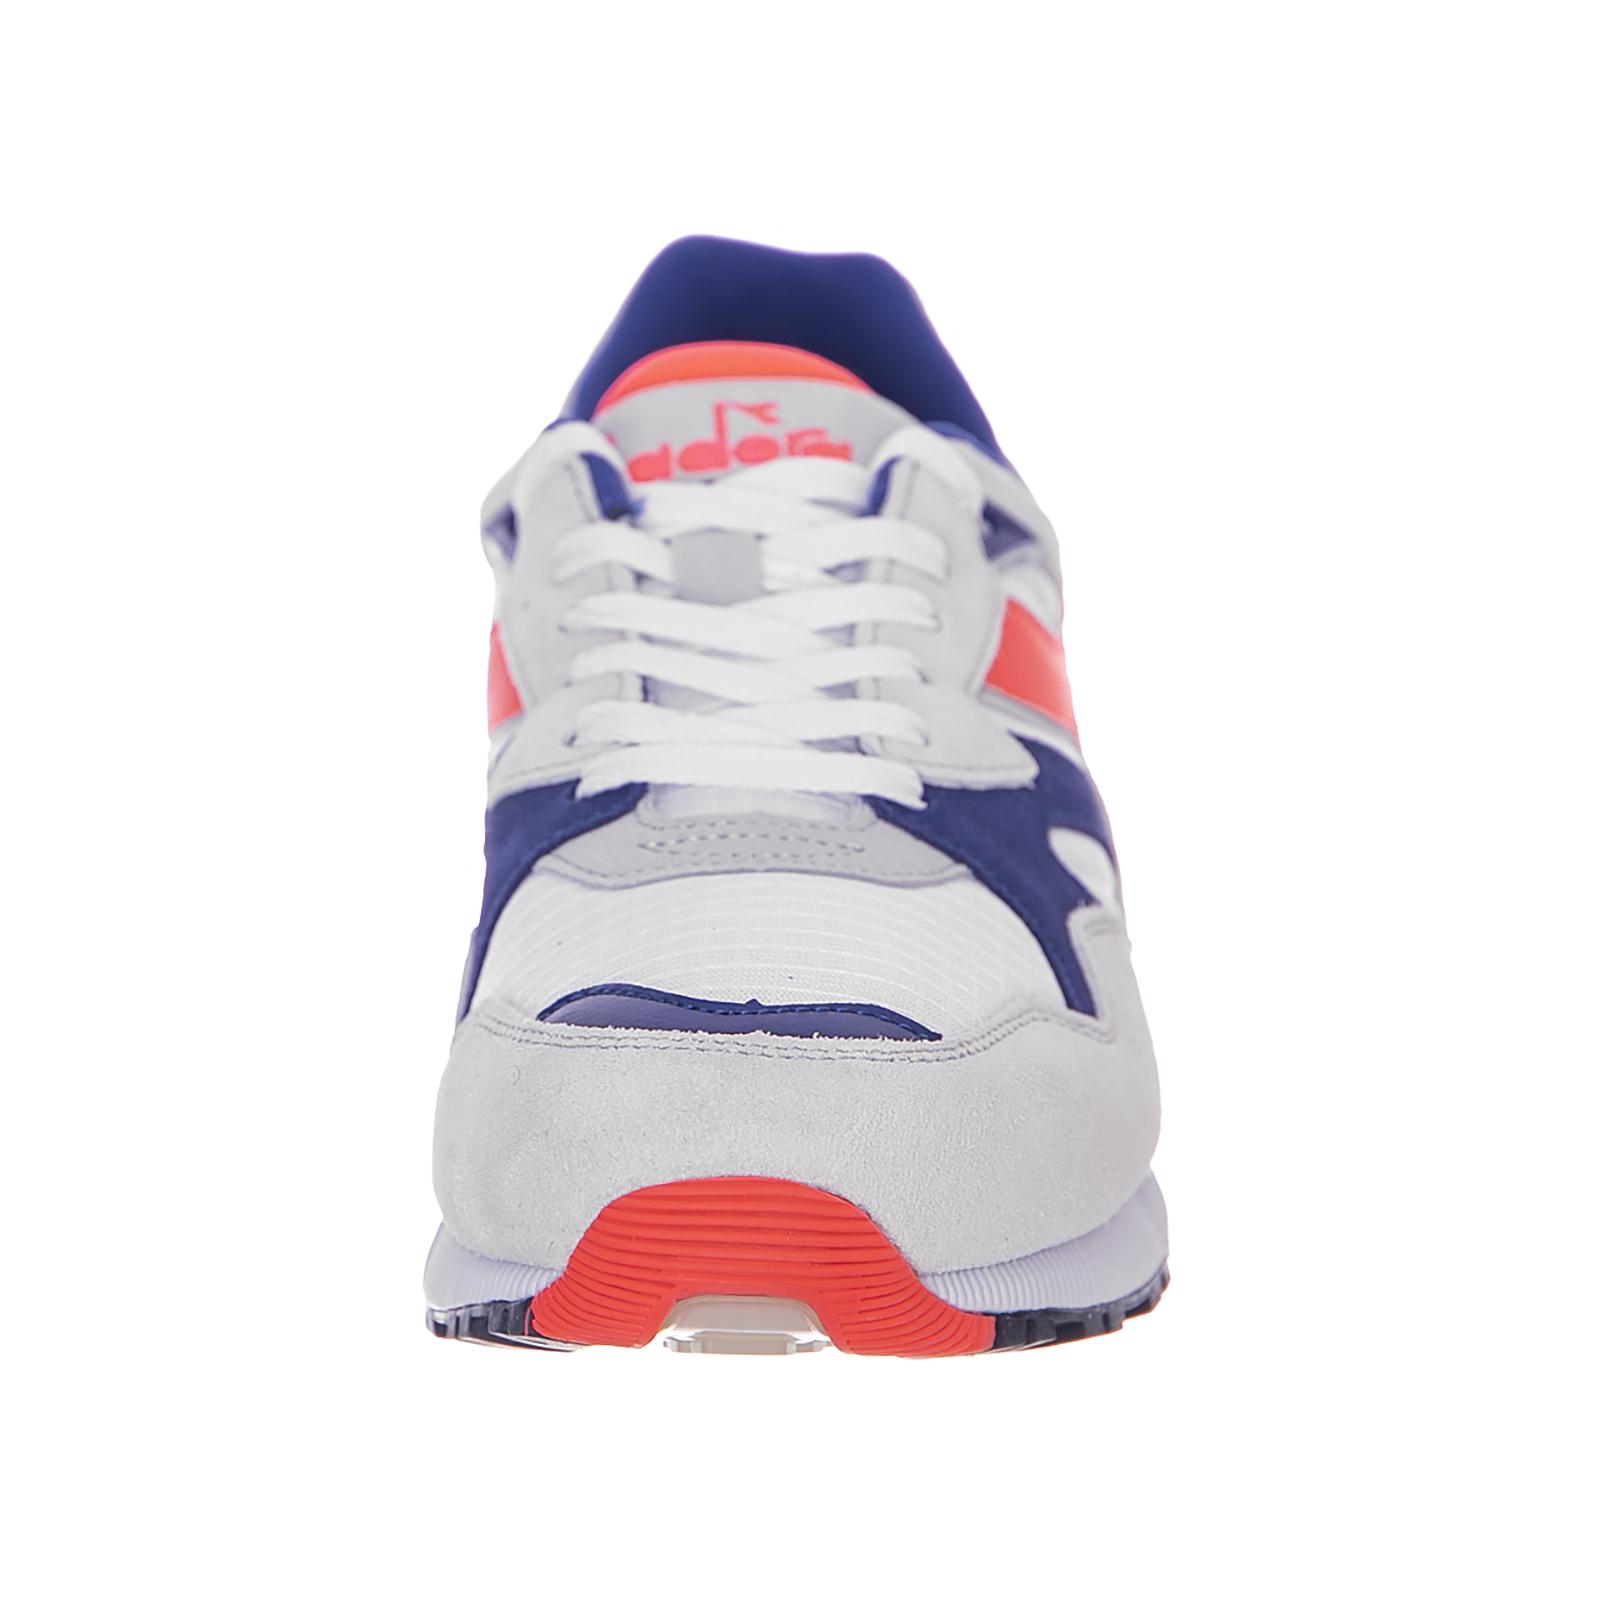 Sneakers Diadora Bianco Cb73b4 N9002 White dPqfHWPr